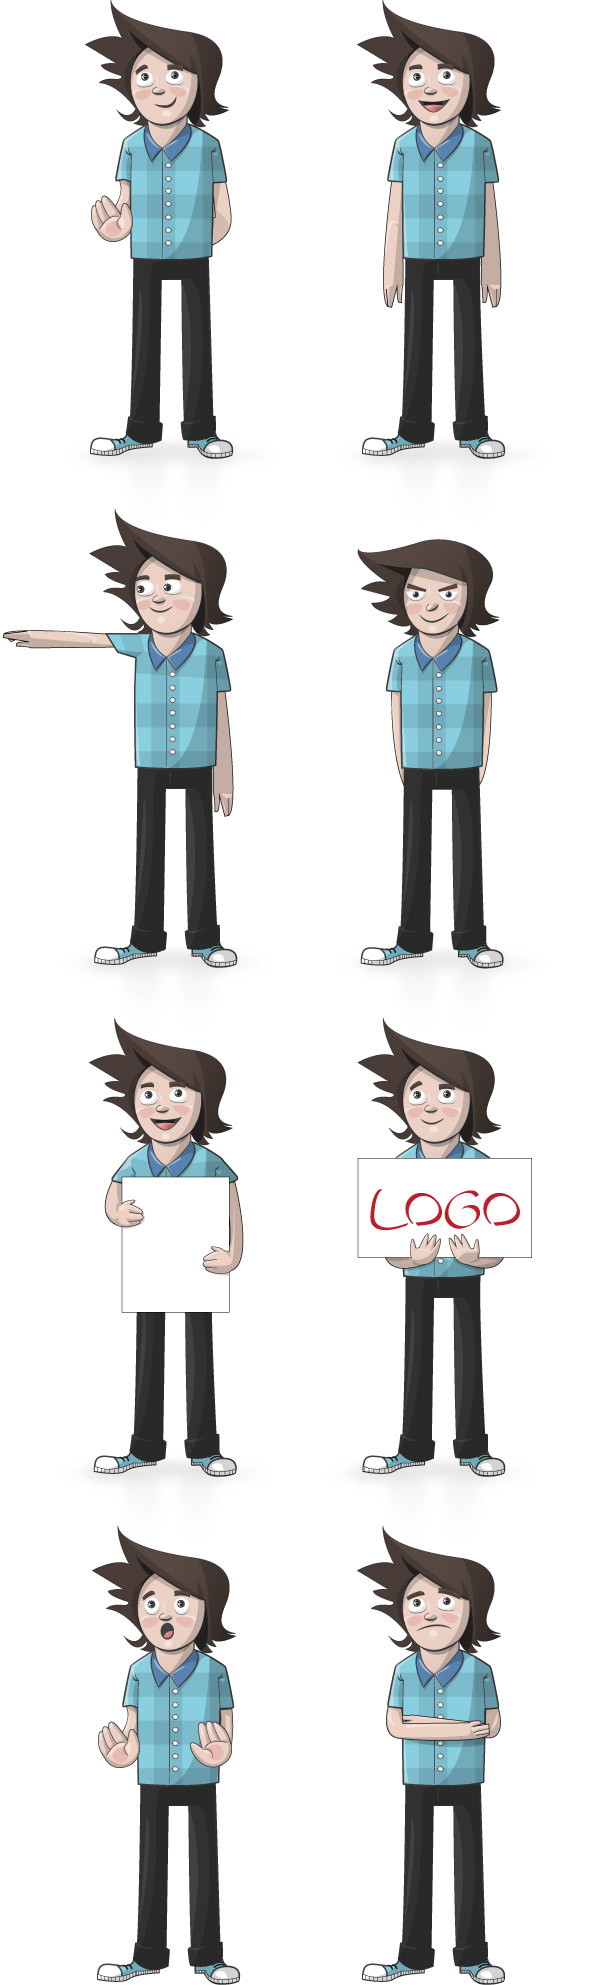 Boy Vector Illustration Preview Full